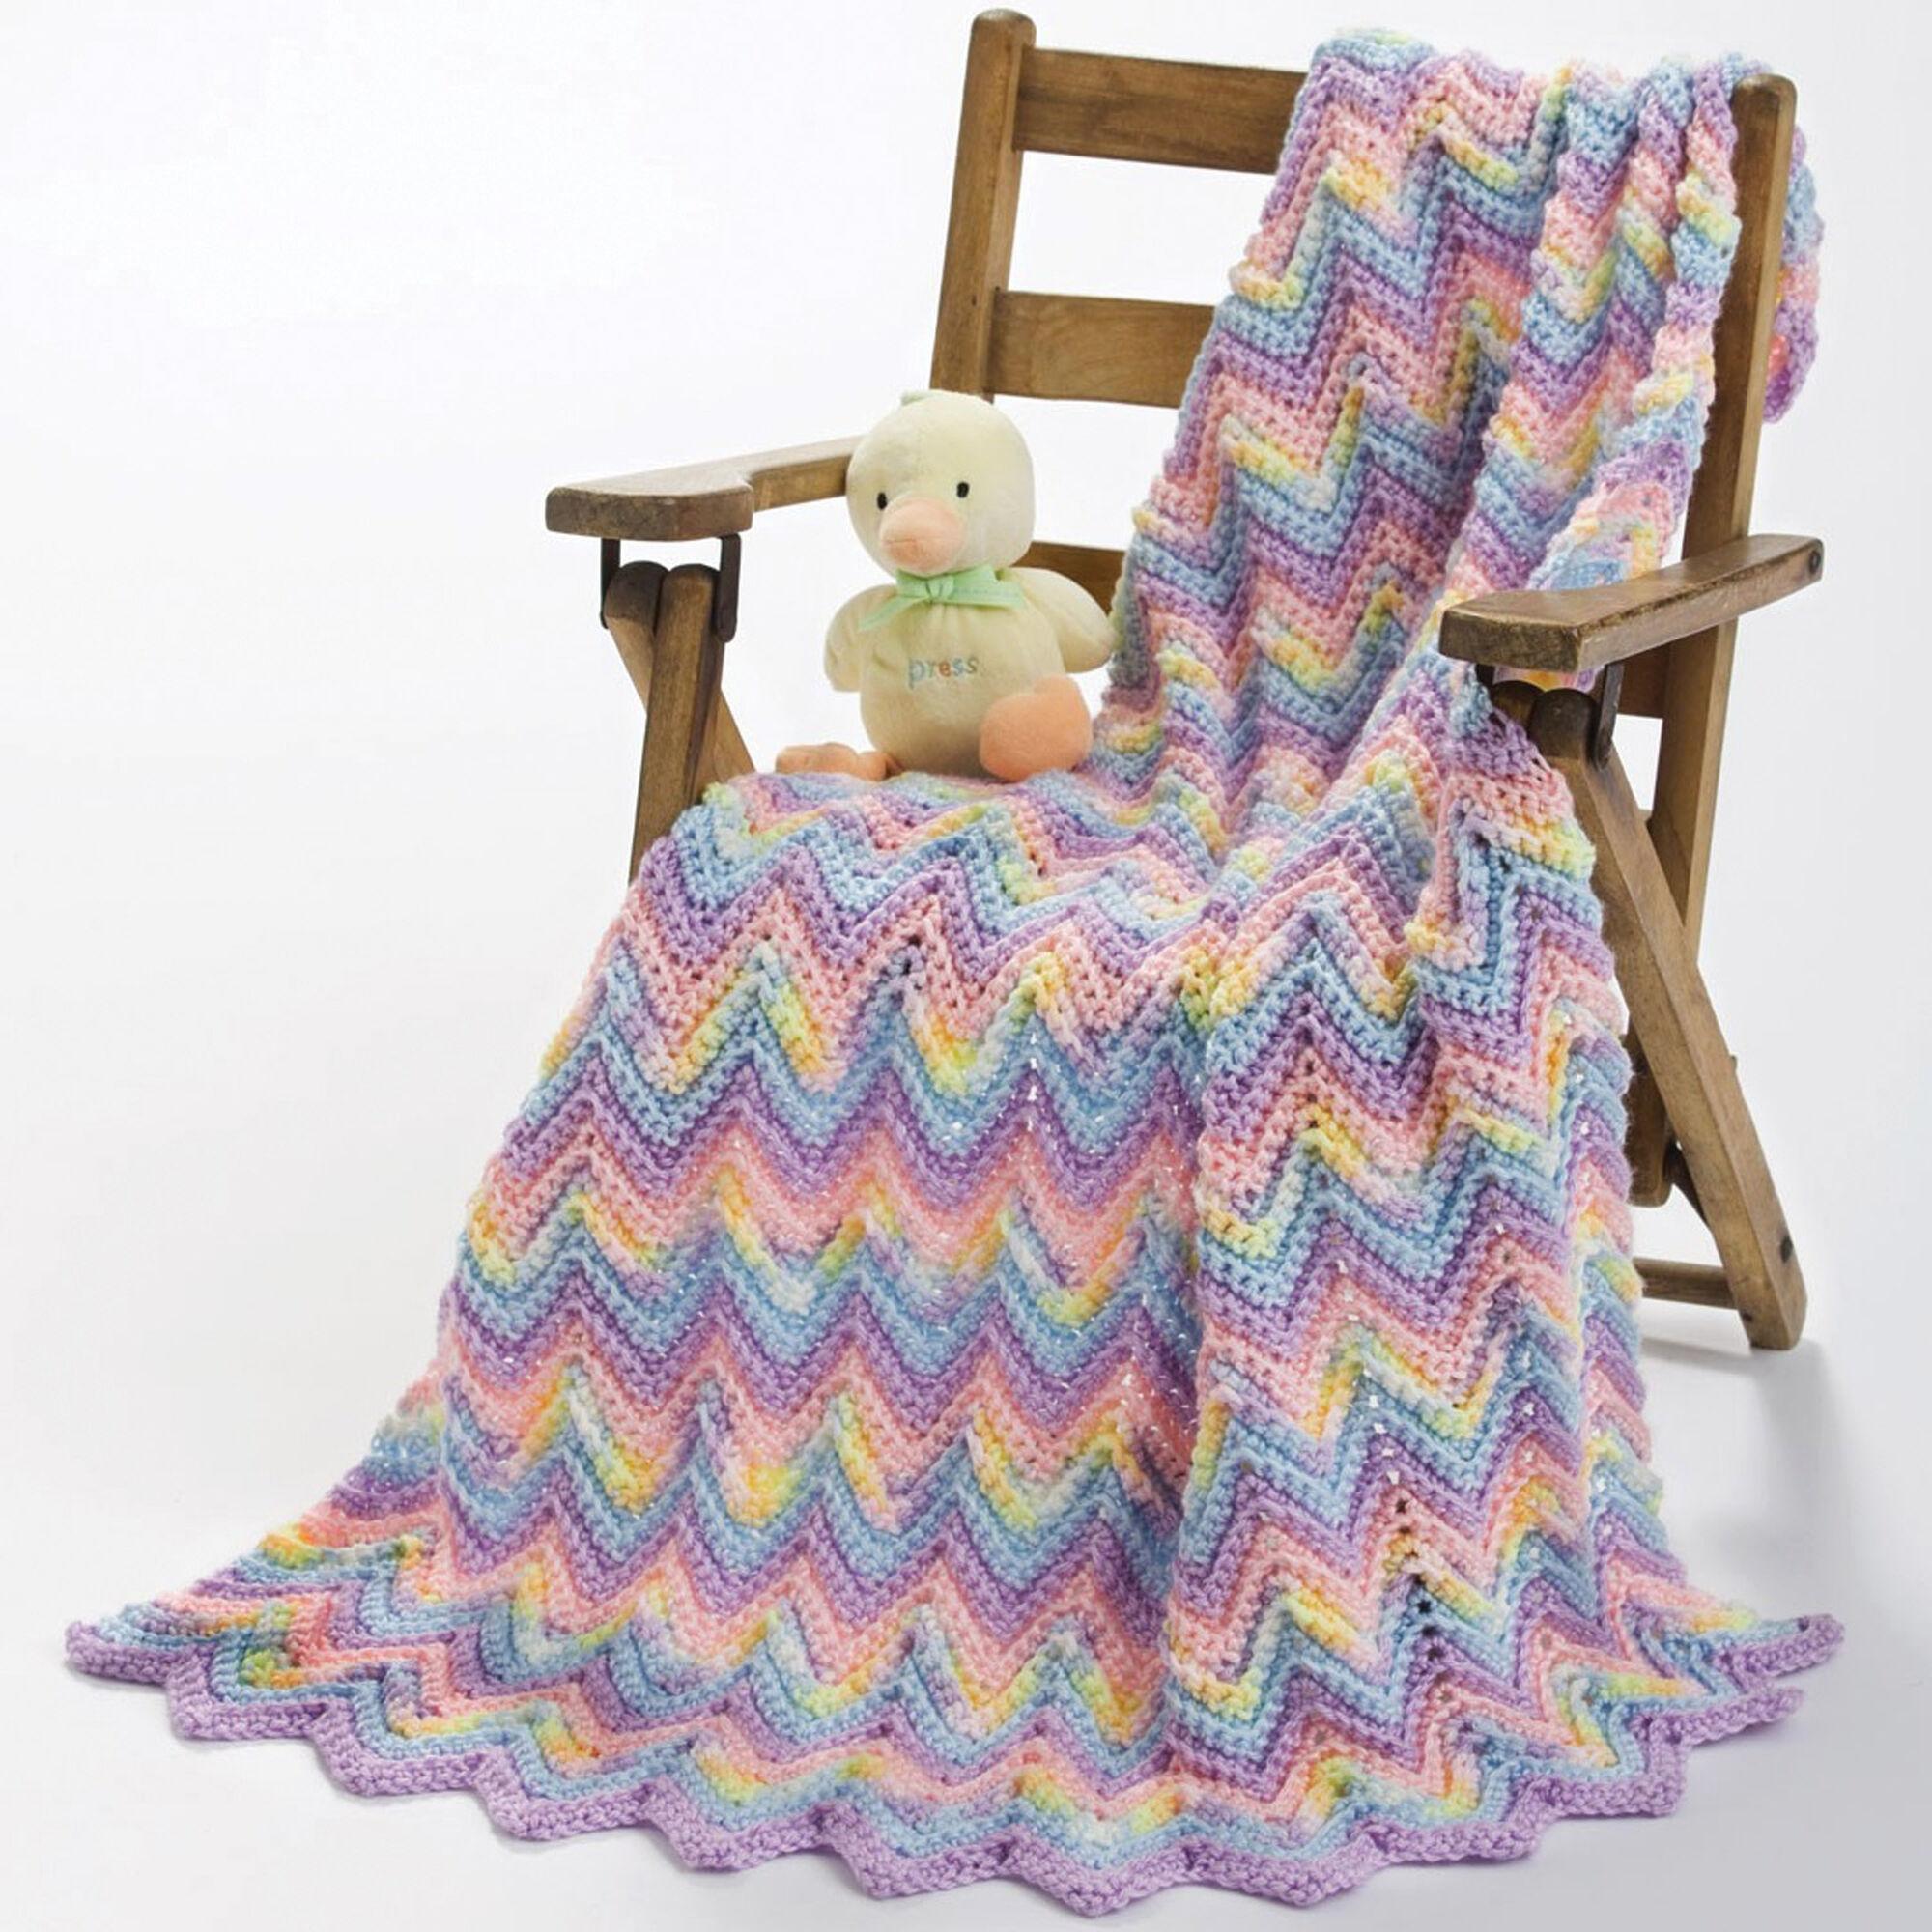 Caron Knit Ripple Baby Blanket Pattern Yarnspirations